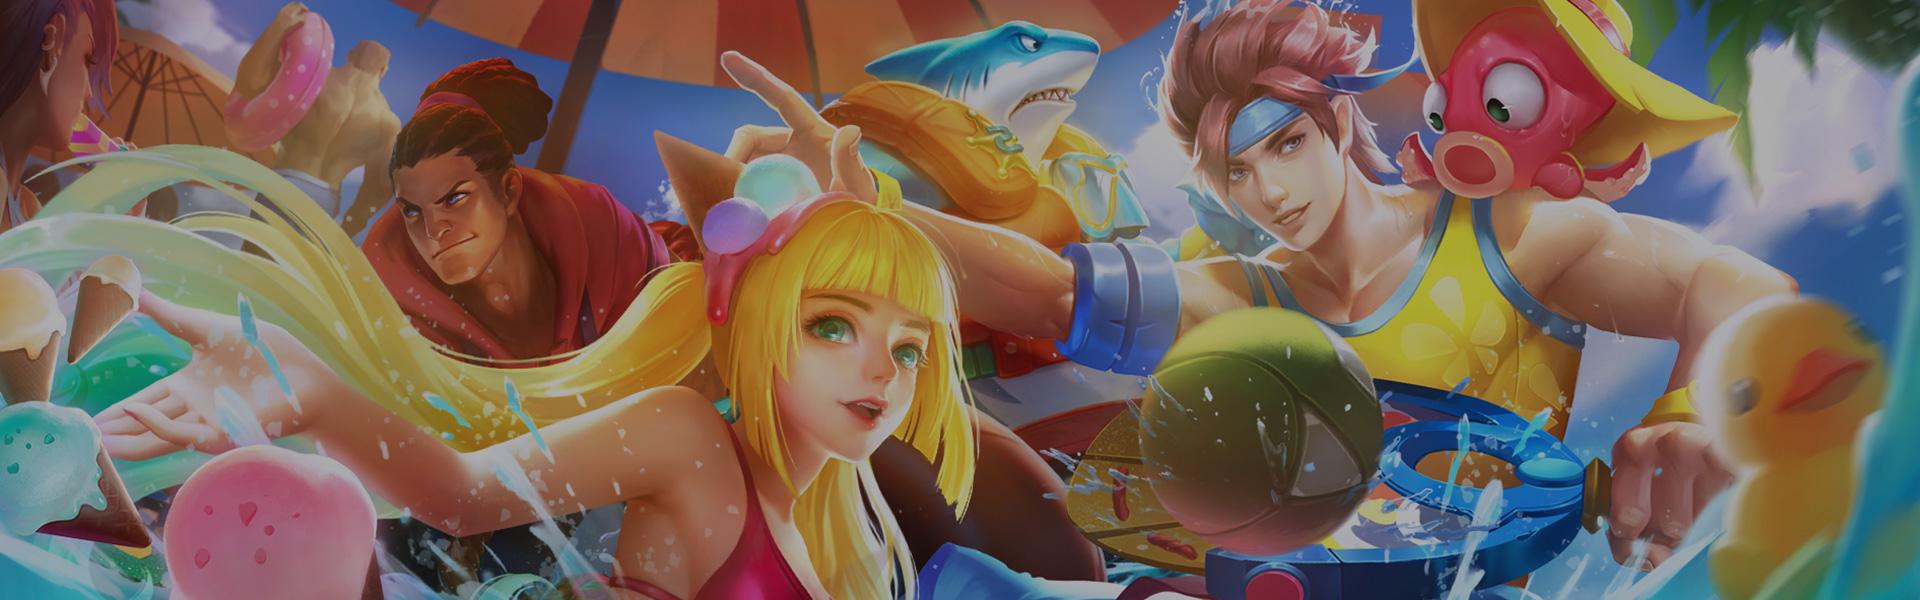 Heroes Evolved Update - September 26th/ October 3rd 2018